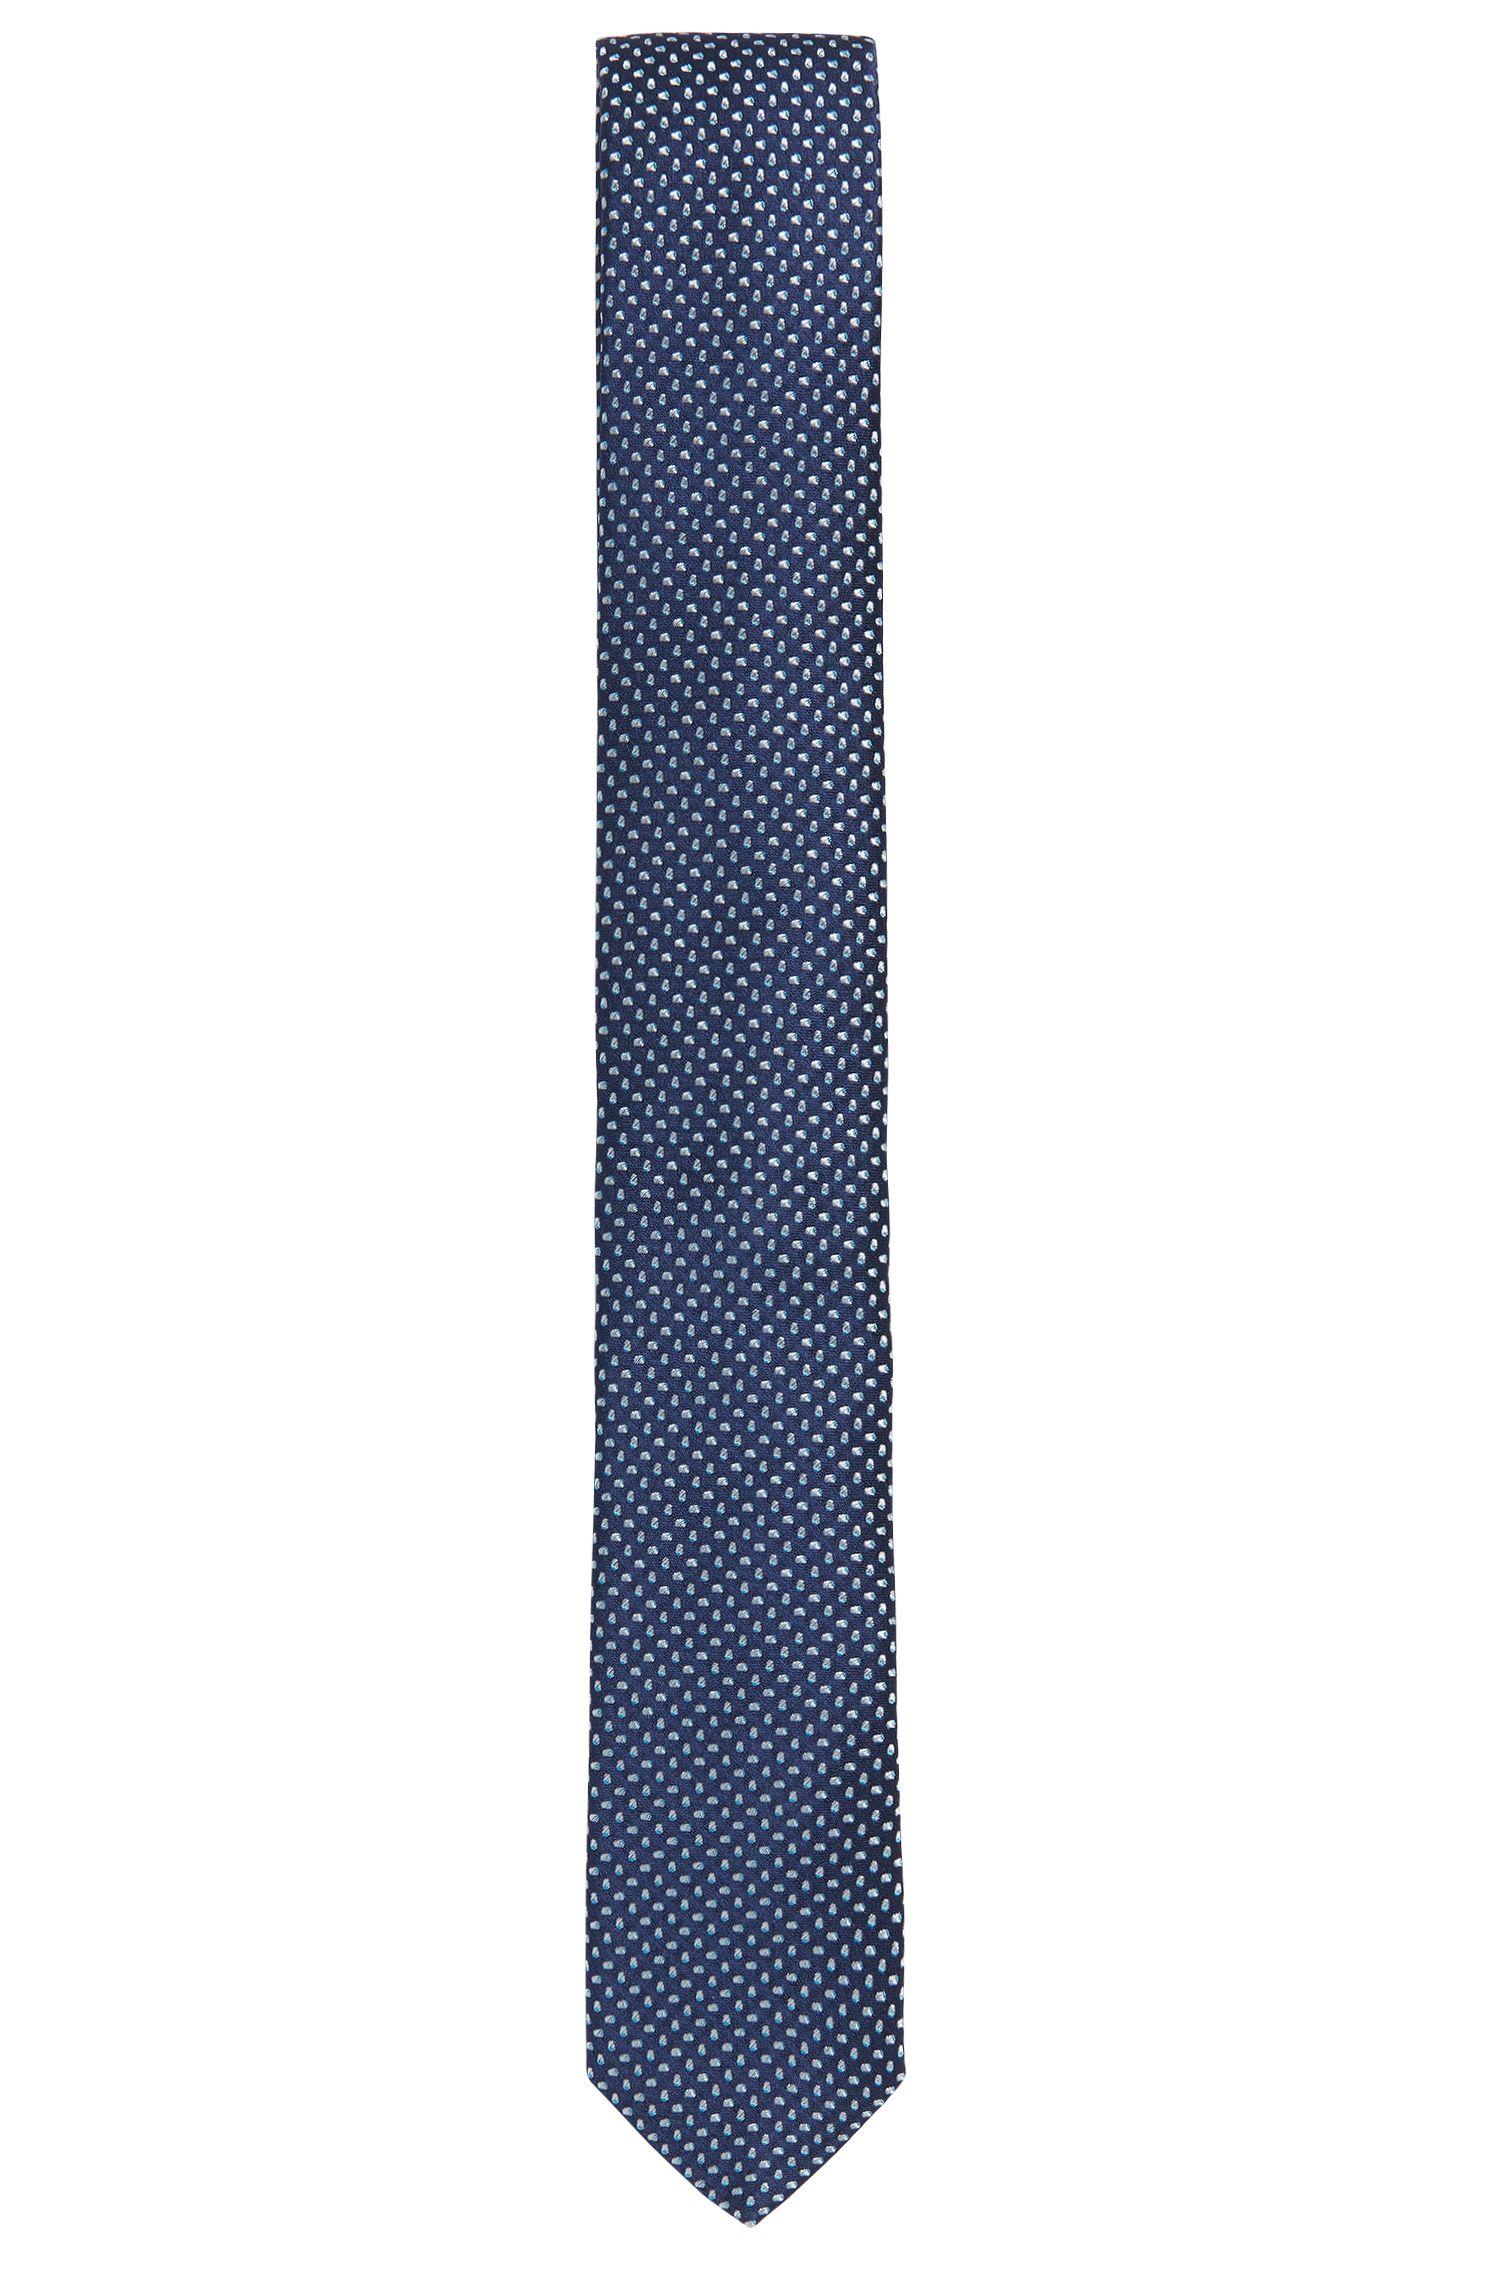 Cravatta a disegni in pregiata seta jacquard